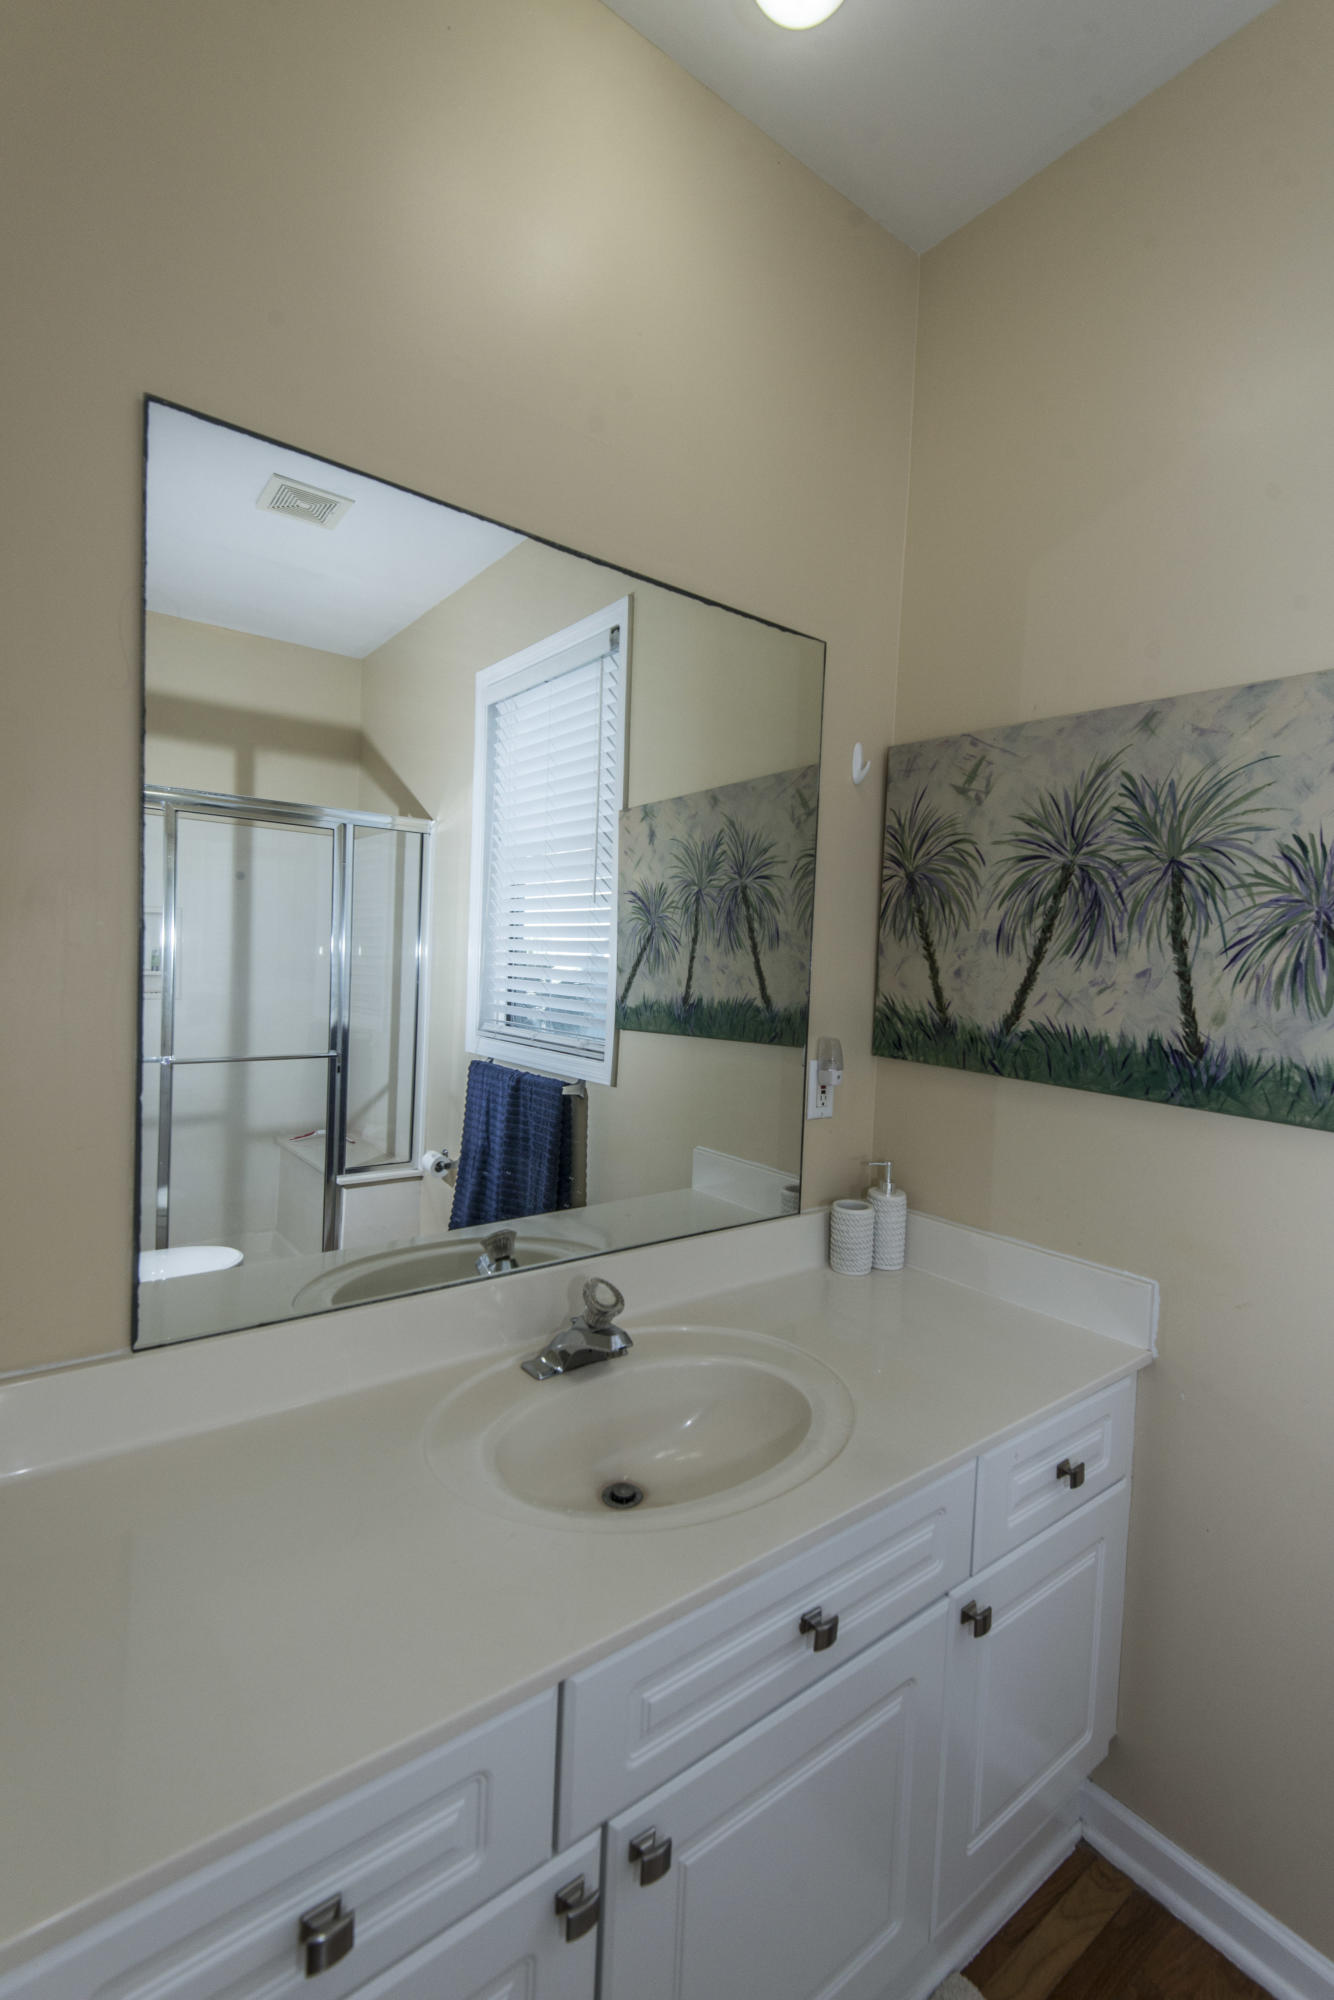 East Folly Beach Shores Homes For Sale - 2 Sumter, Folly Beach, SC - 26